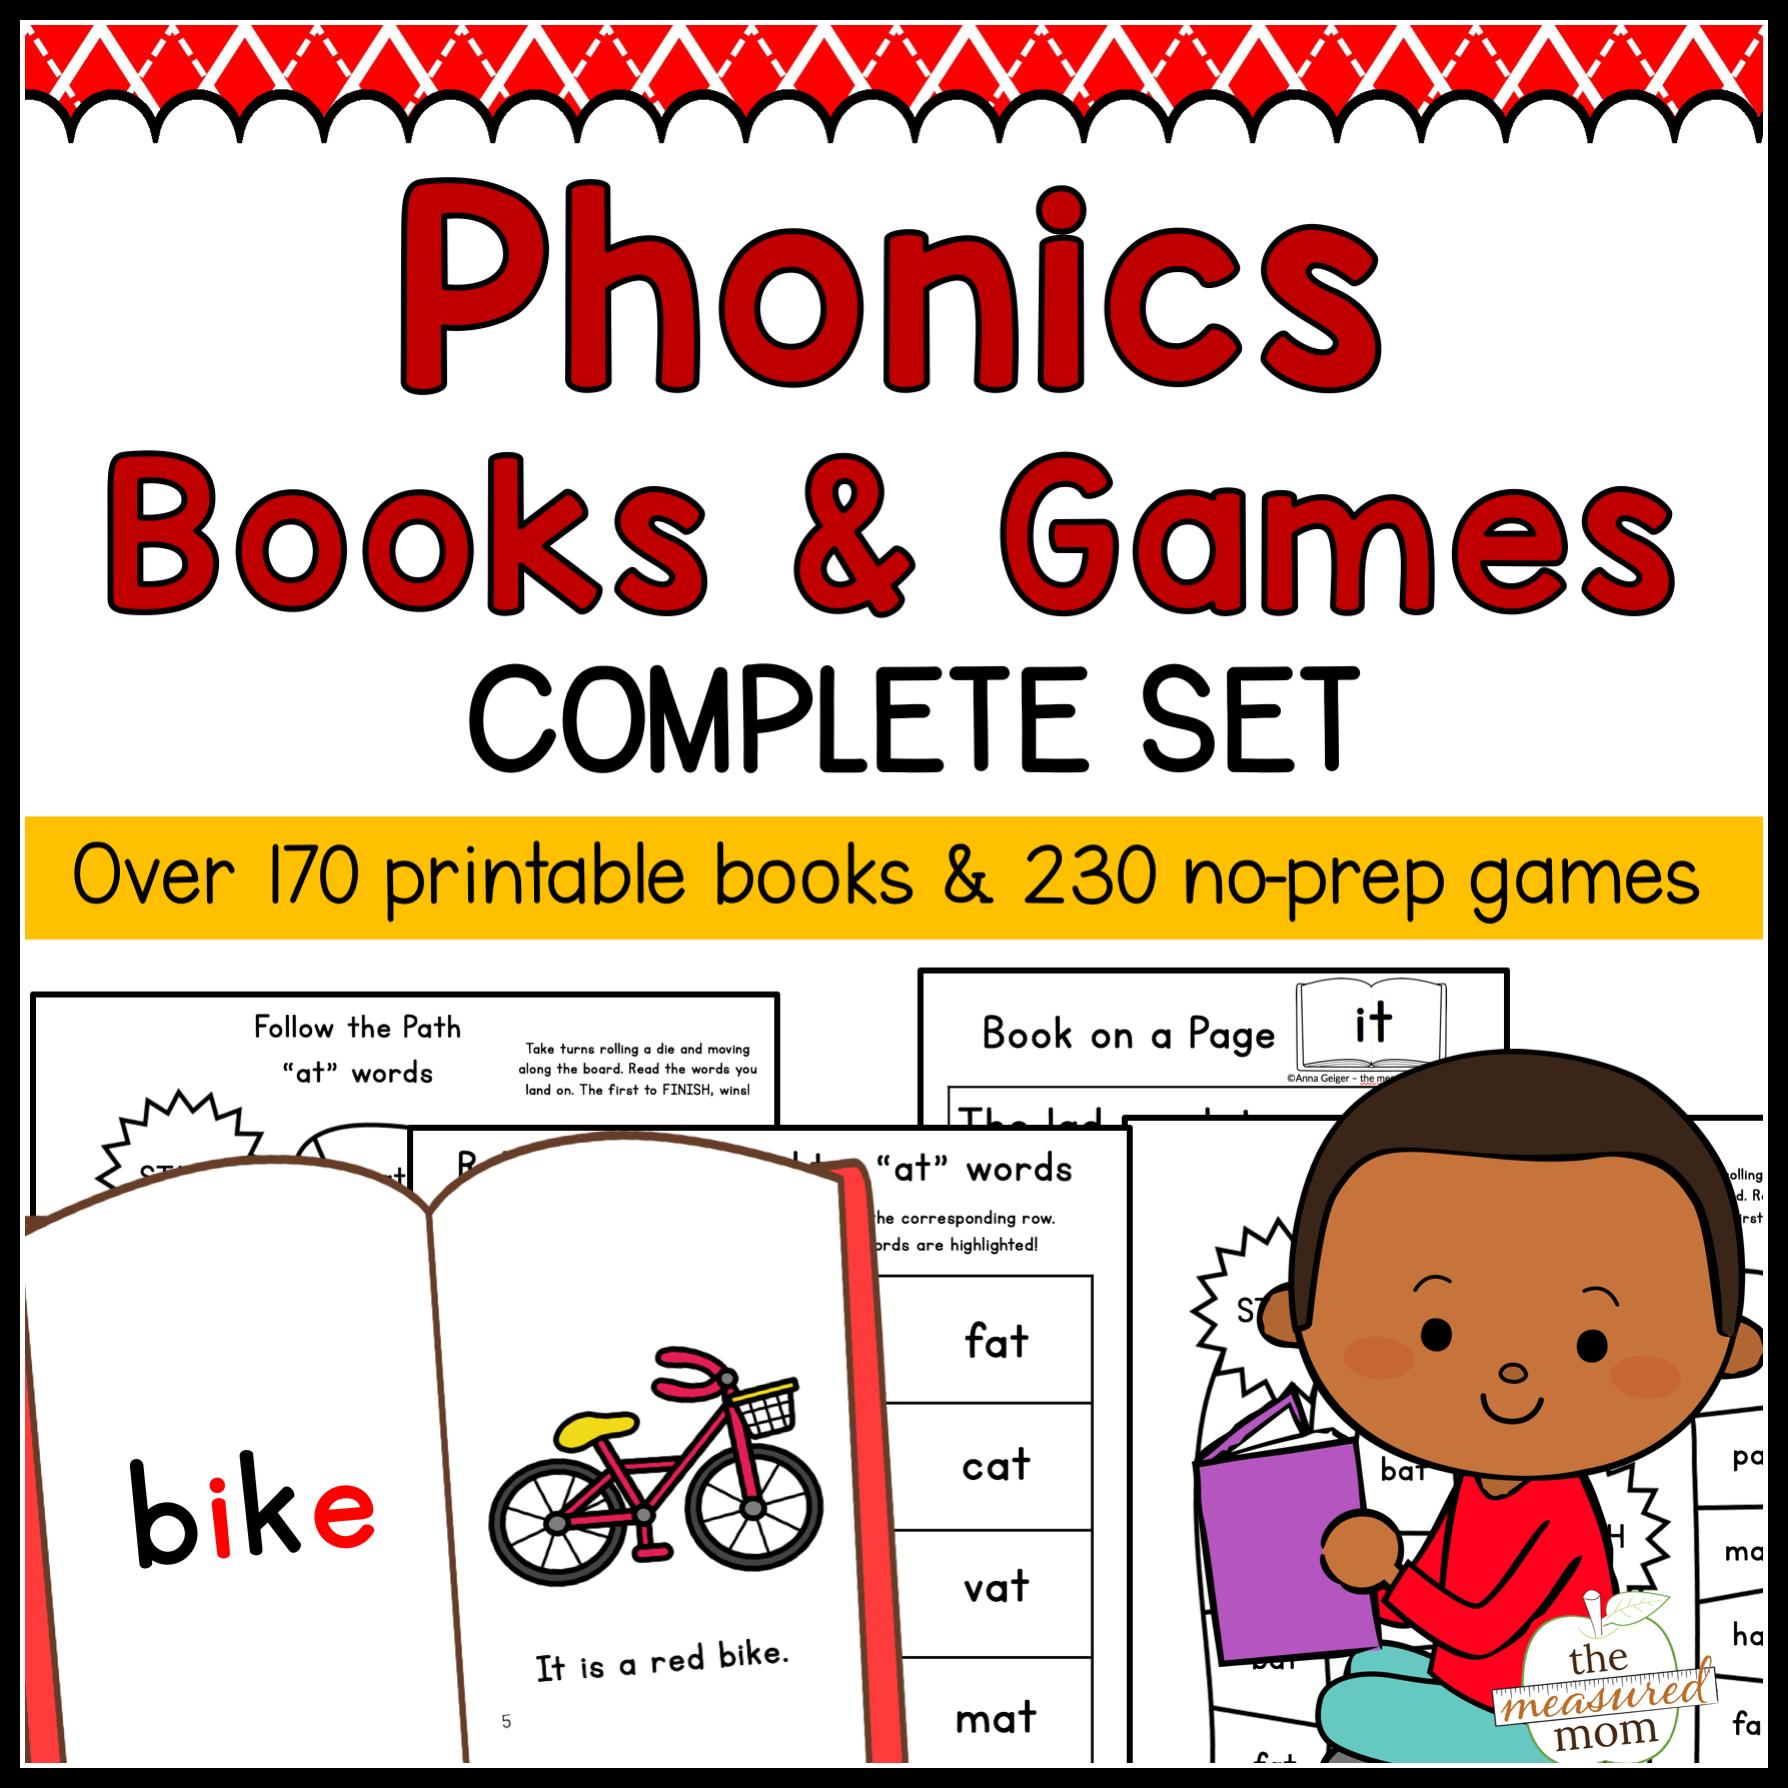 Phonics Books & Games - Complete Set - The Measured Mom - Free Printable Phonics Books